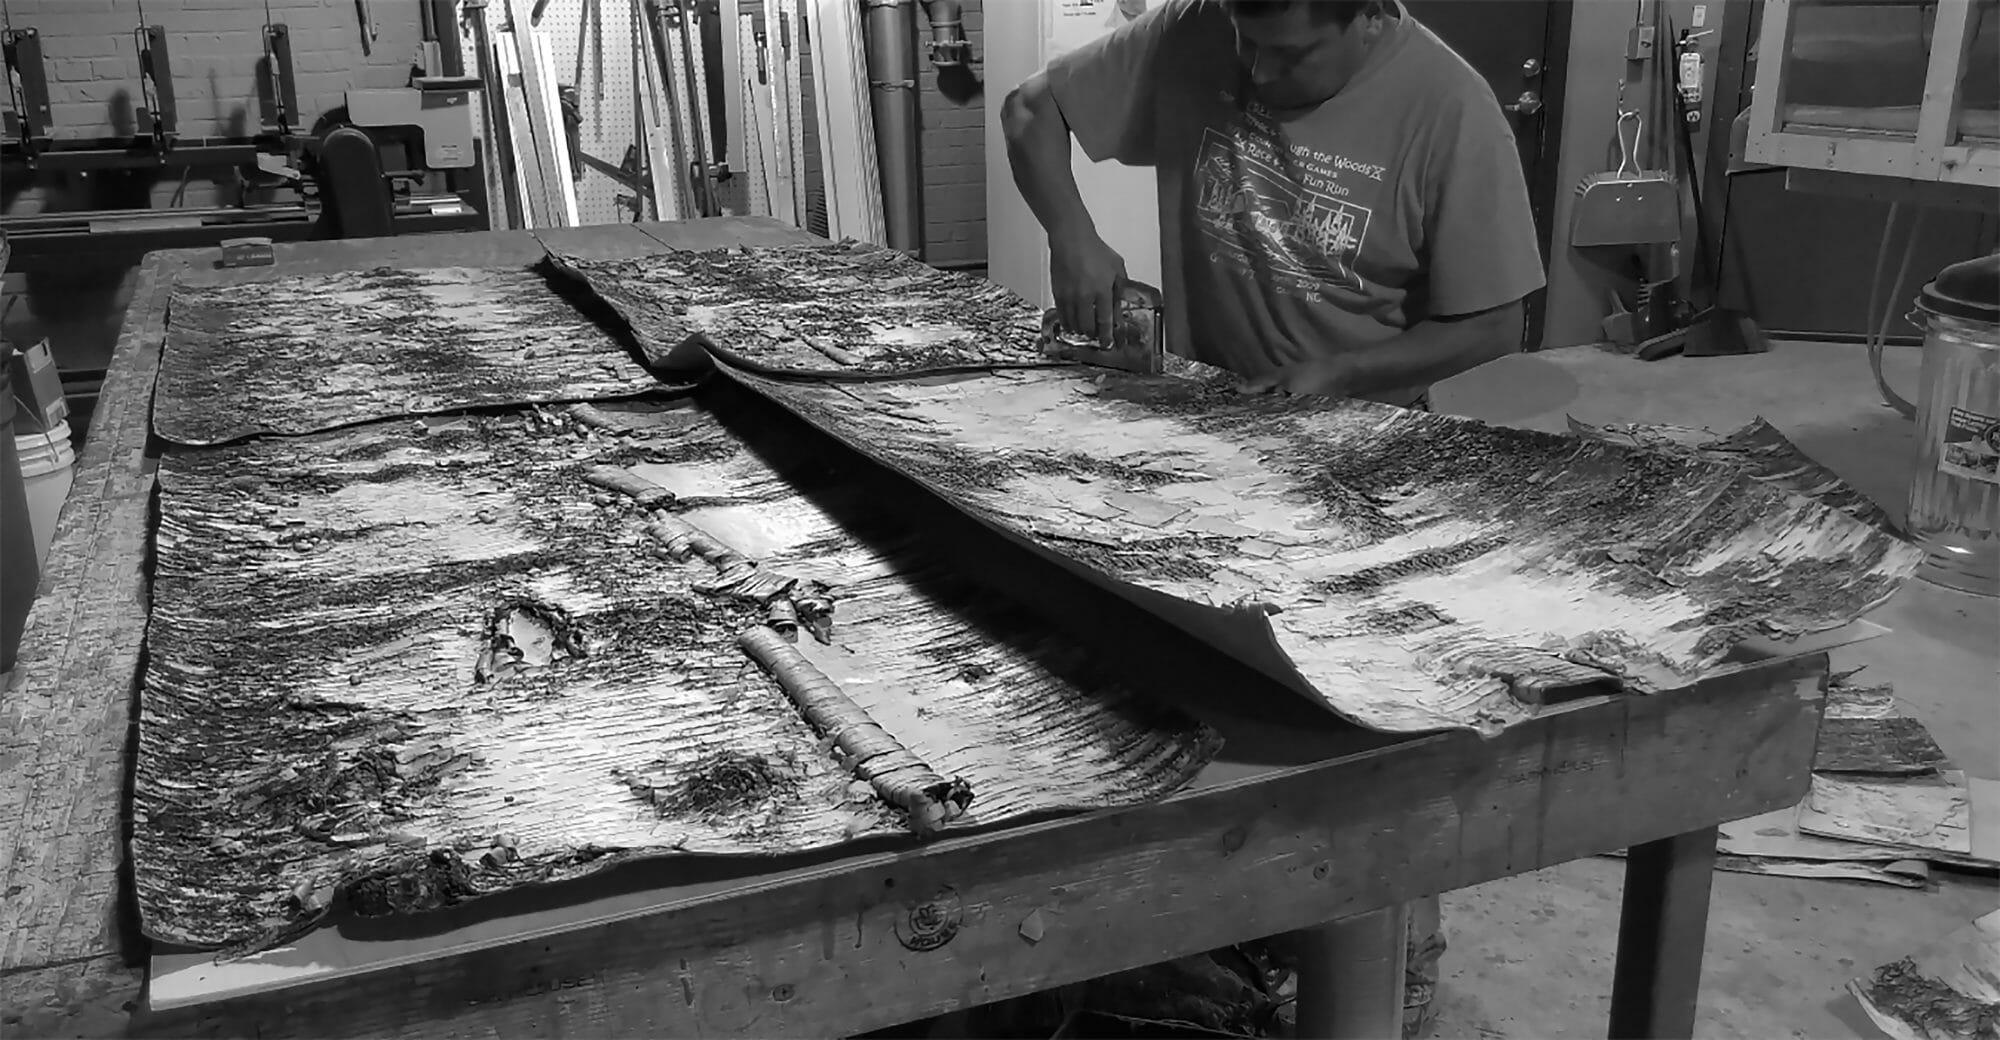 Berto creating Bark House White Birch Bark wall covering panels